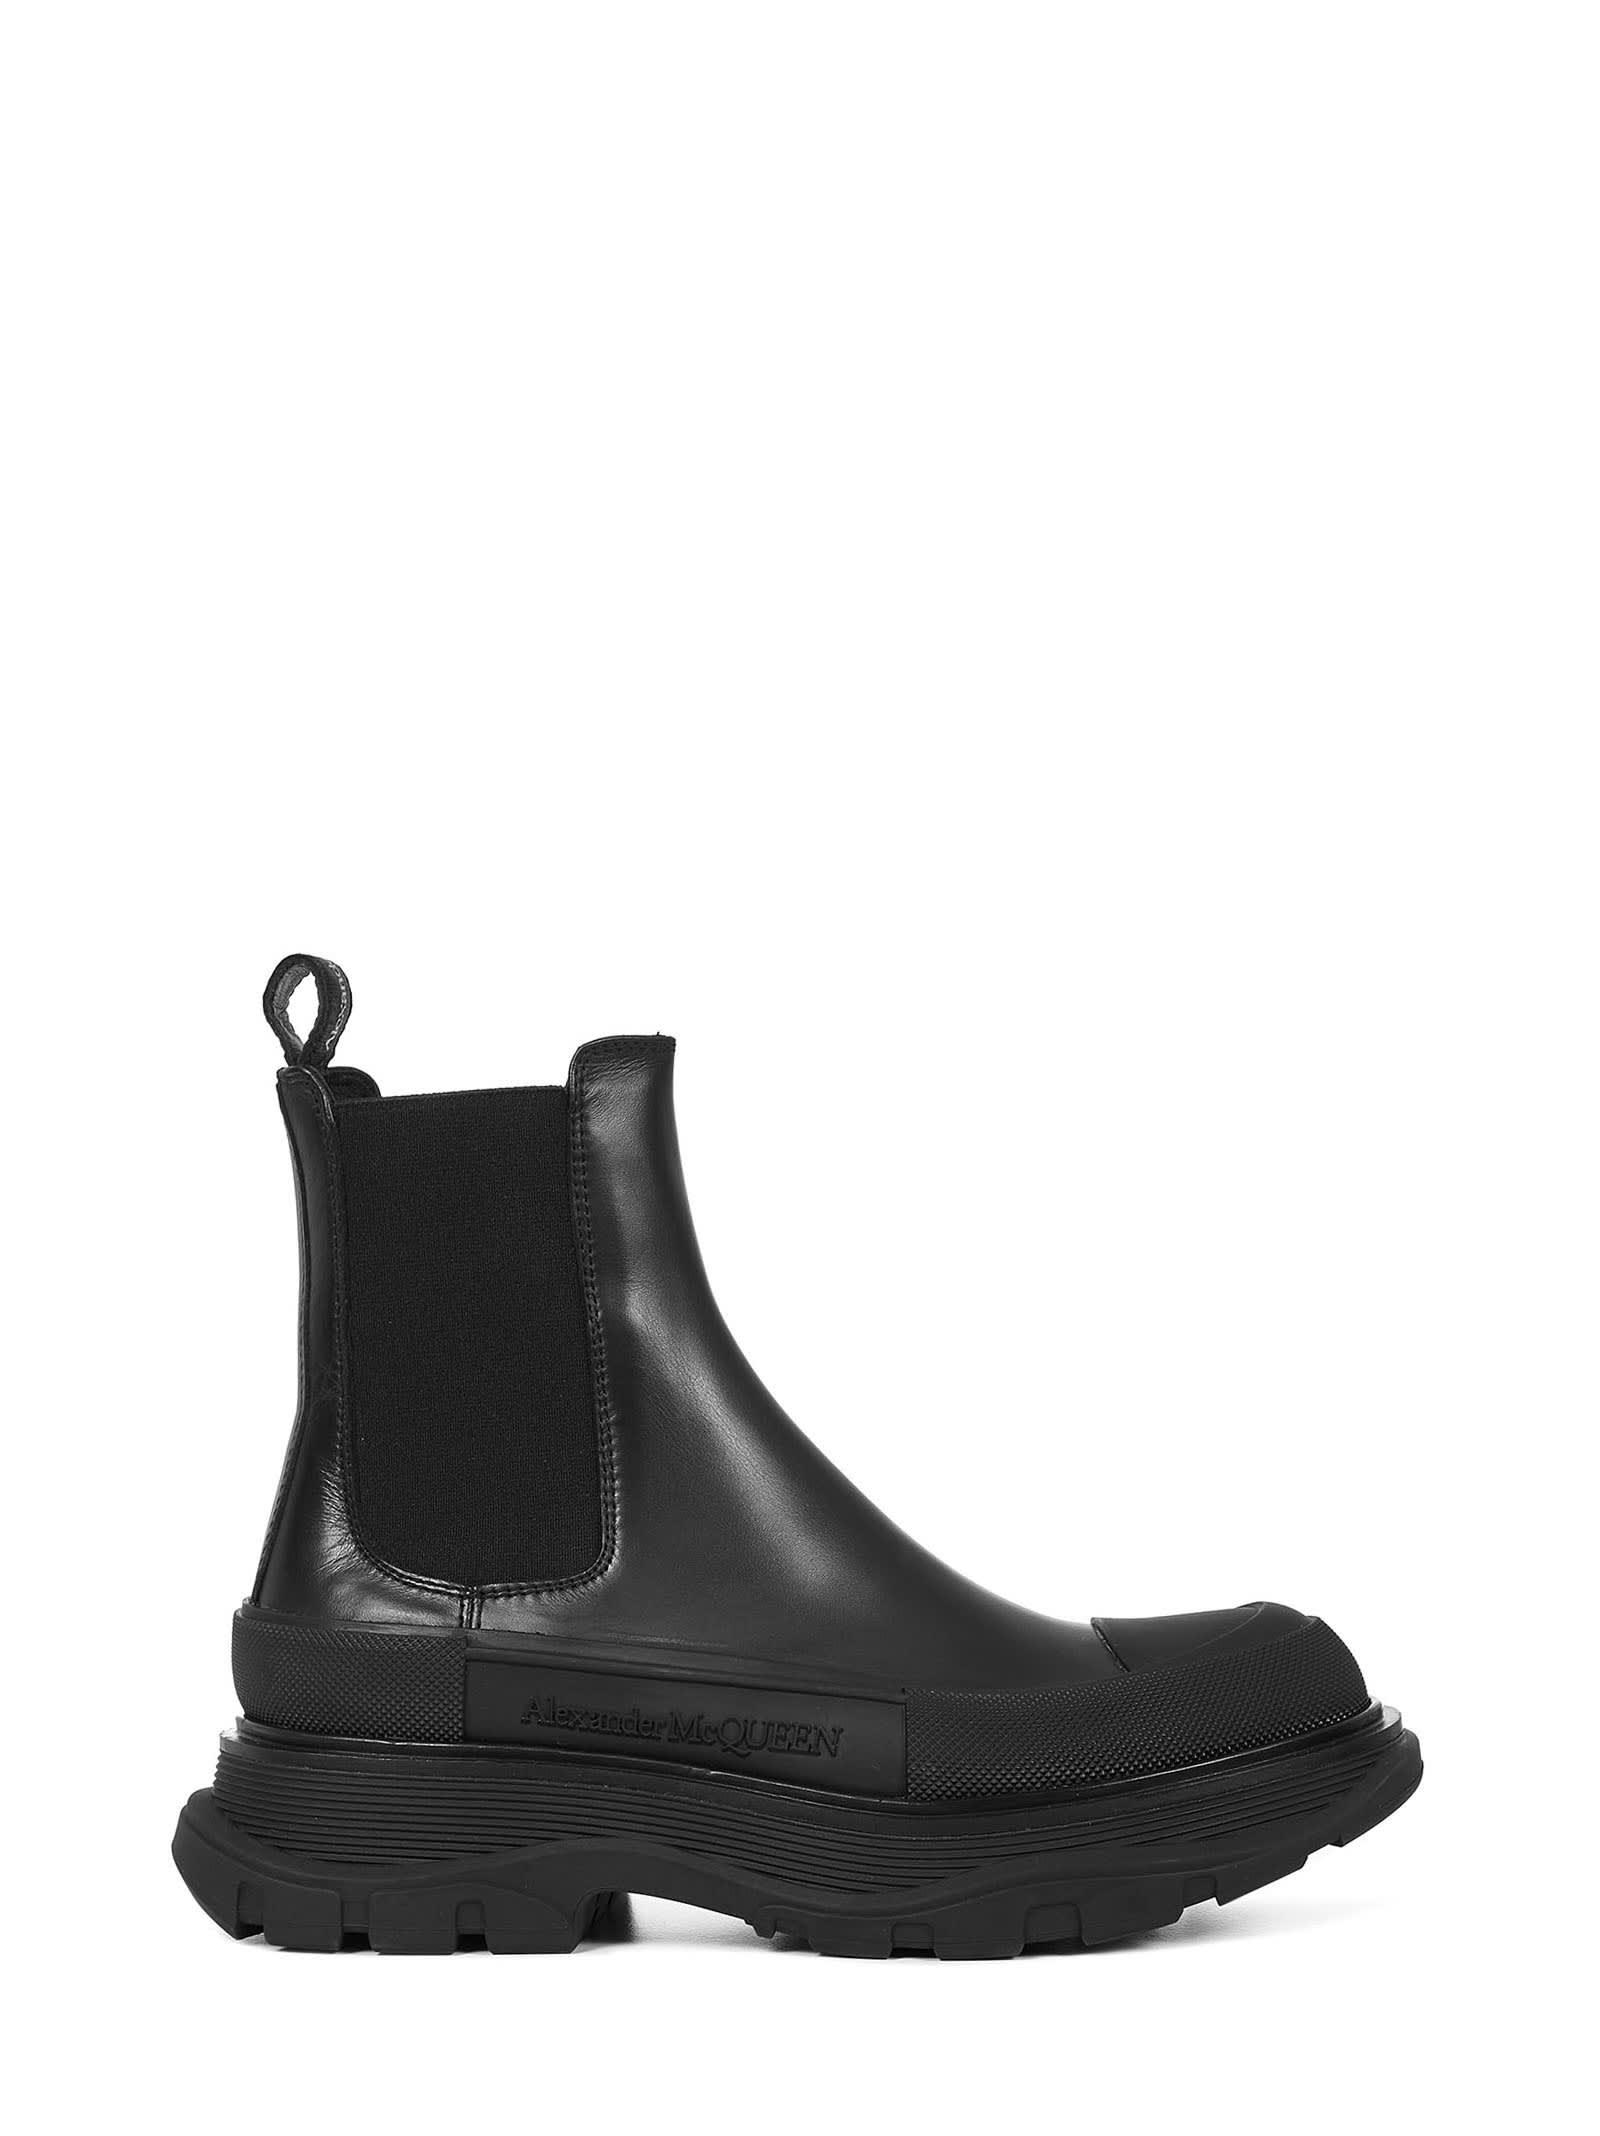 Buy Alexander McQueen Chelsea Boots online, shop Alexander McQueen shoes with free shipping